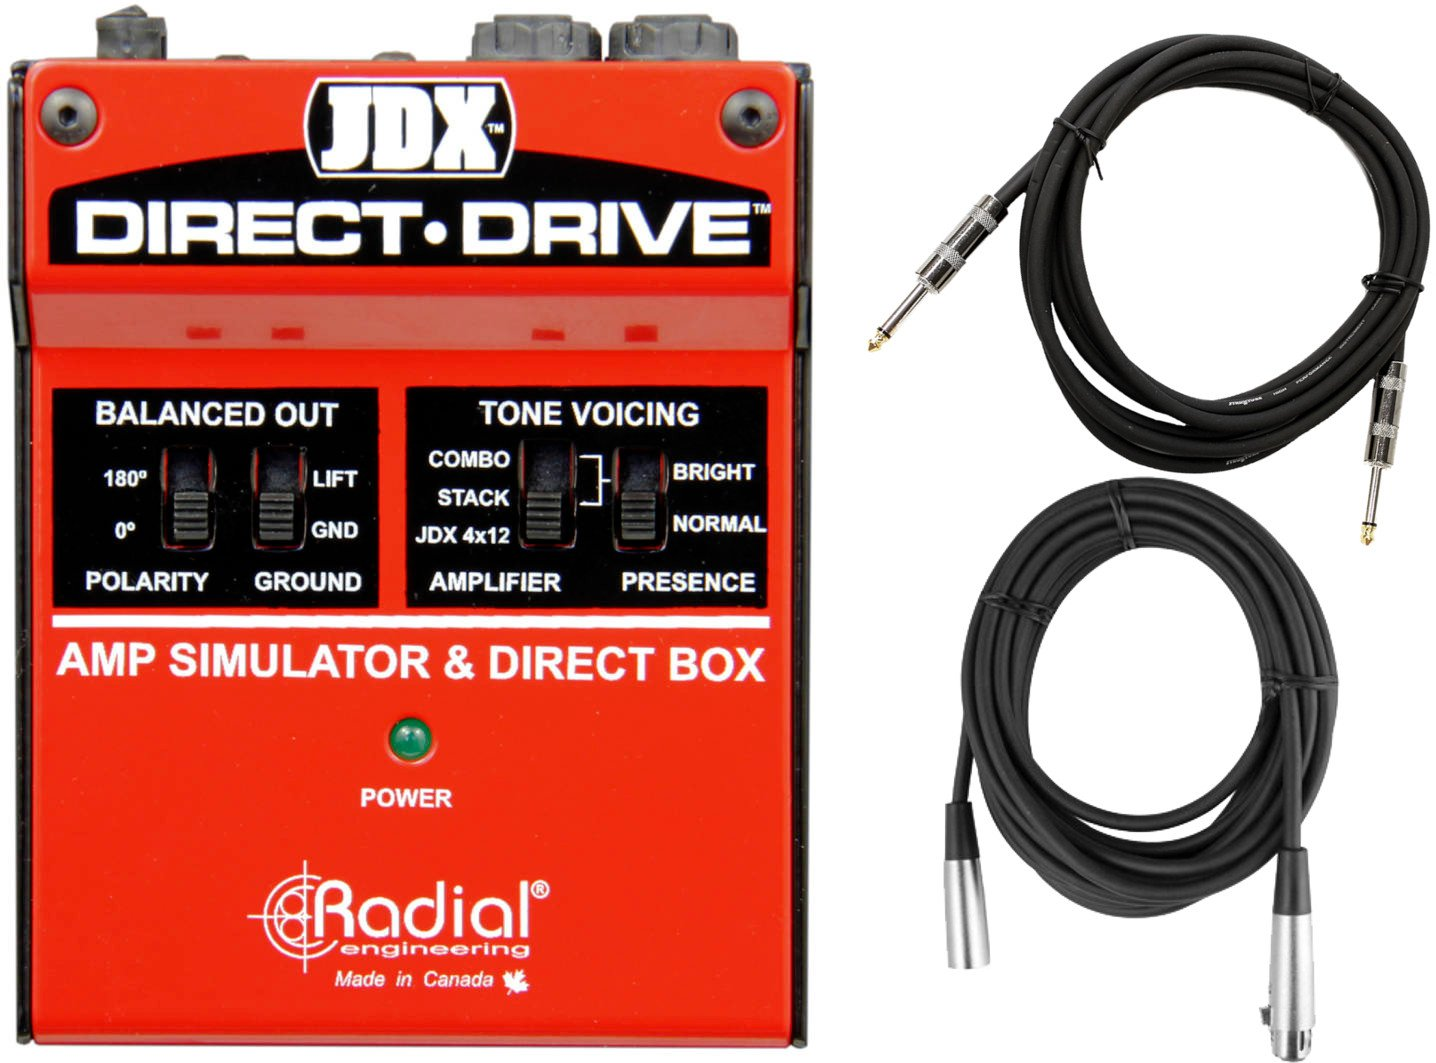 Radial JDX Direct Drive Guitar Amp Simulator DI w/ 2 Cables by Radial (Image #1)